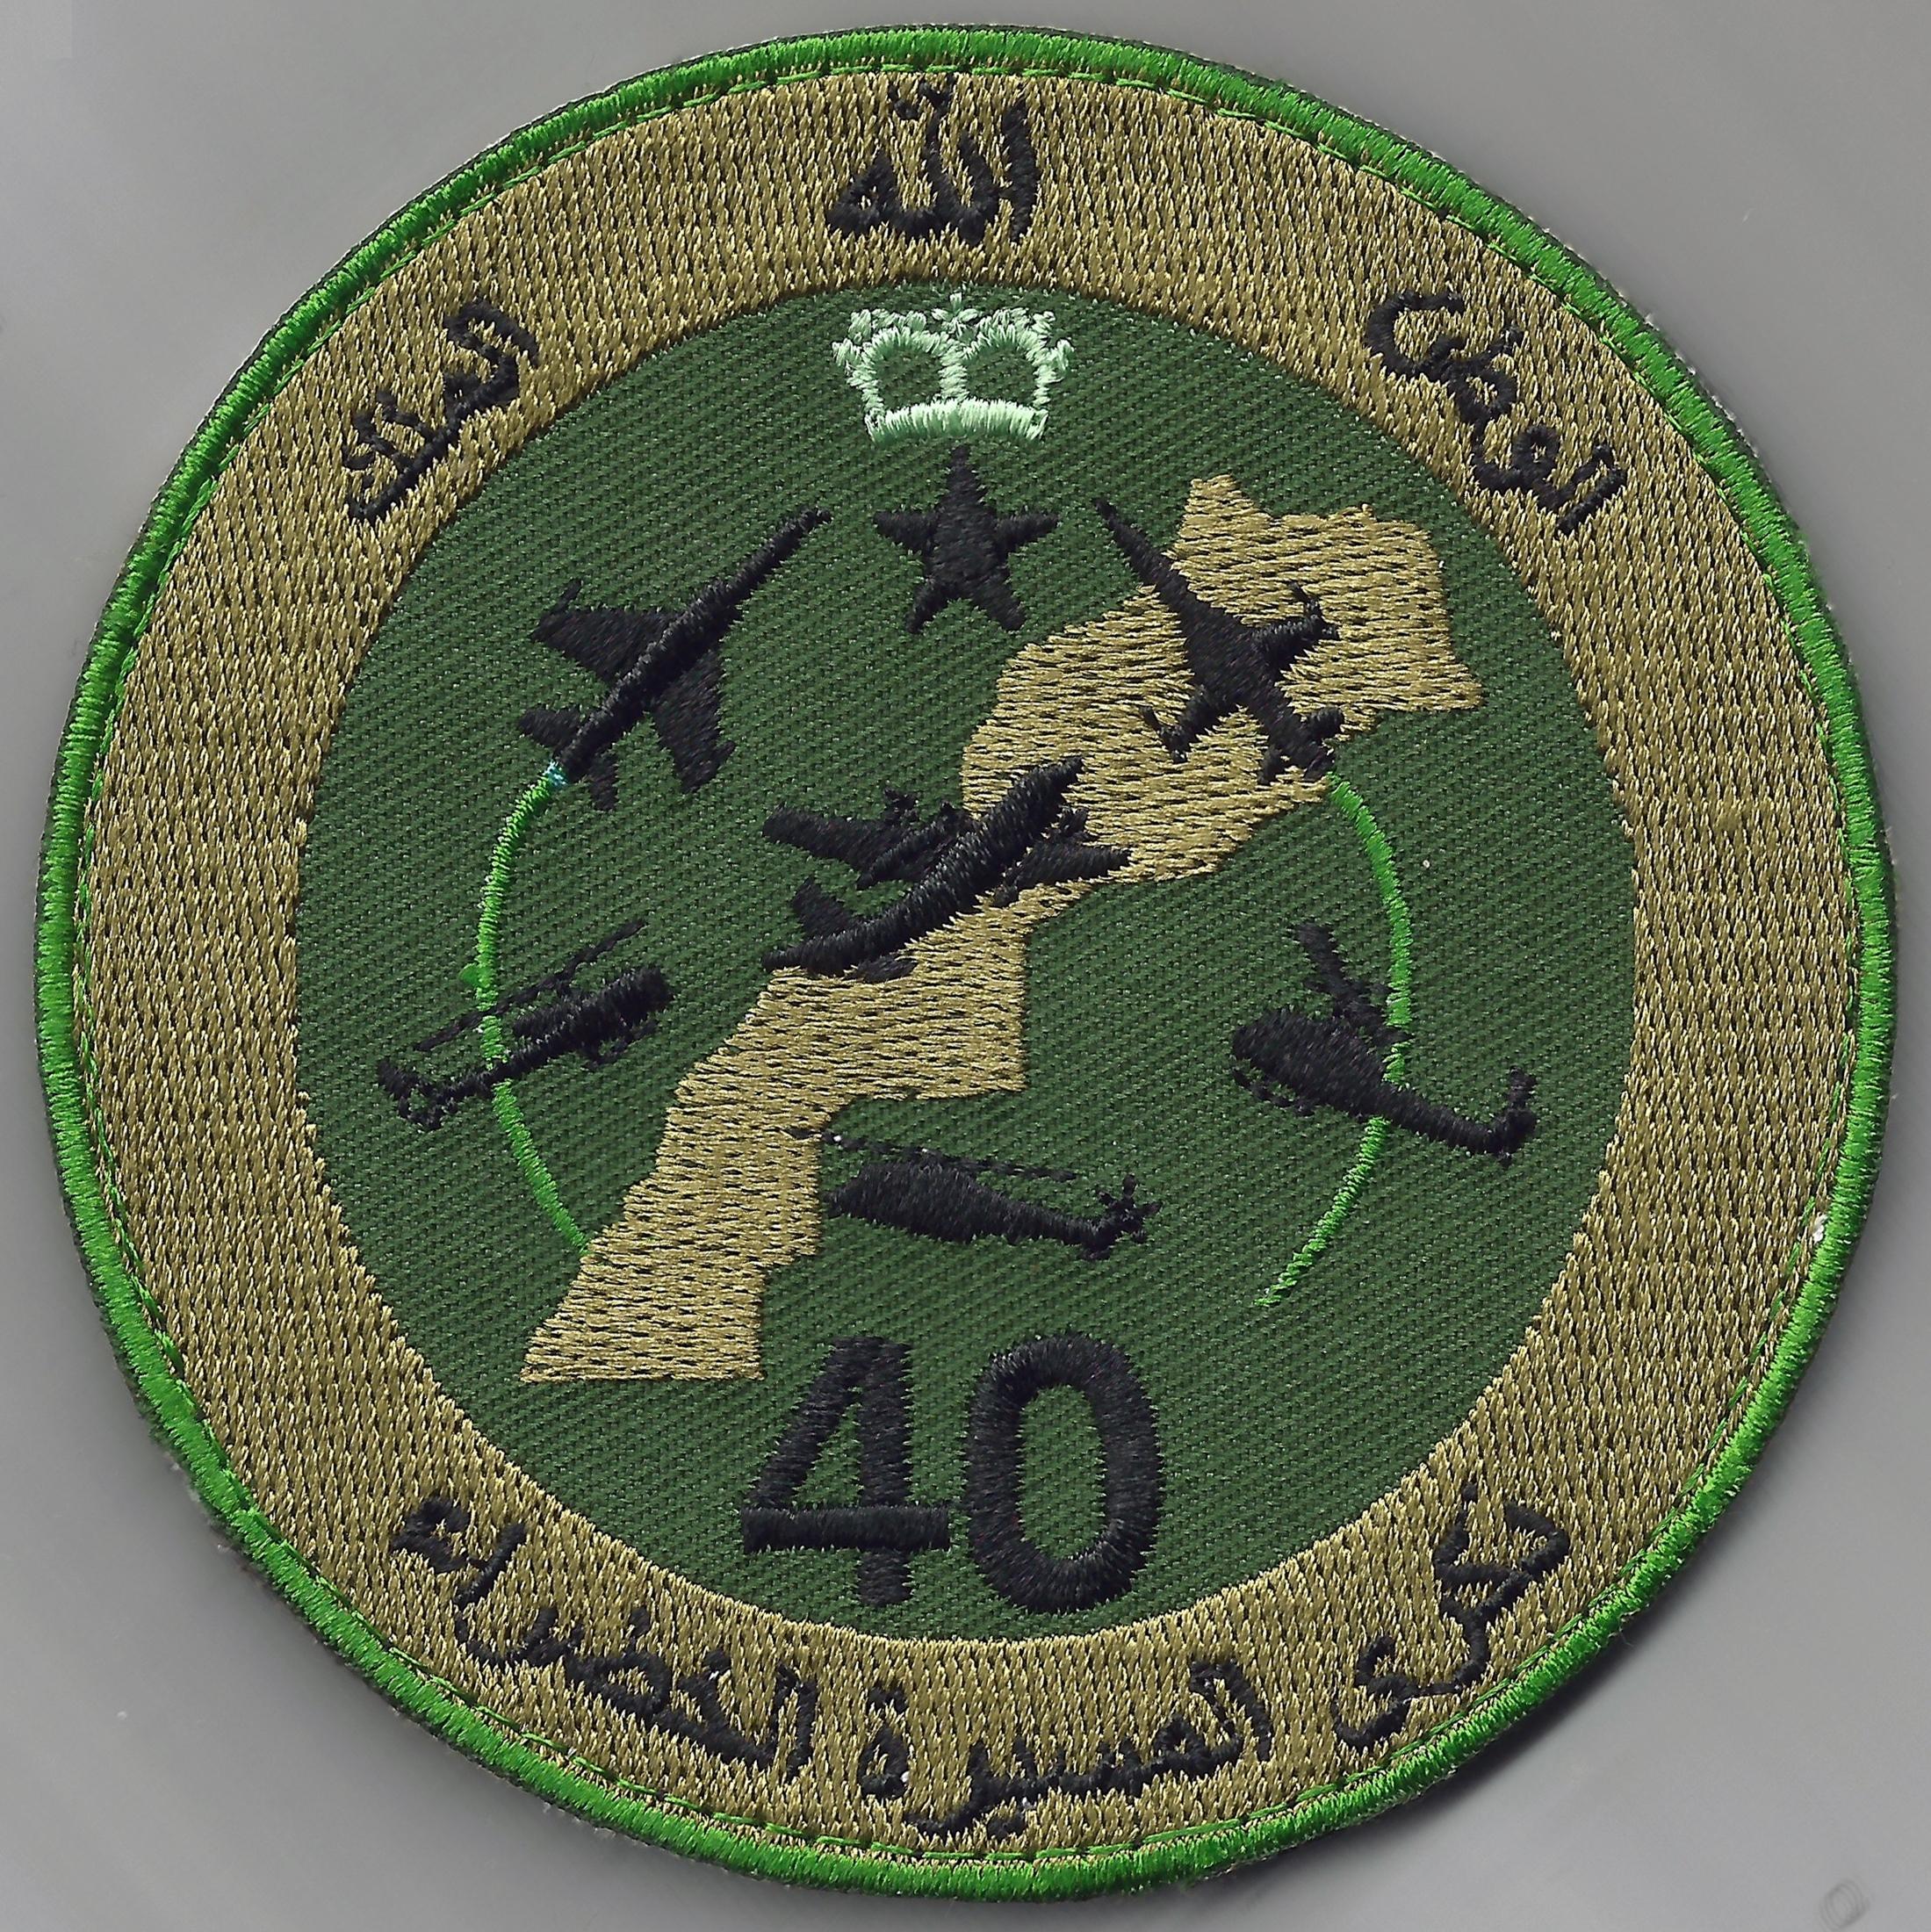 RMAF insignia Swirls Patches / Ecussons,cocardes et Insignes Des FRA - Page 5 160312053214523186